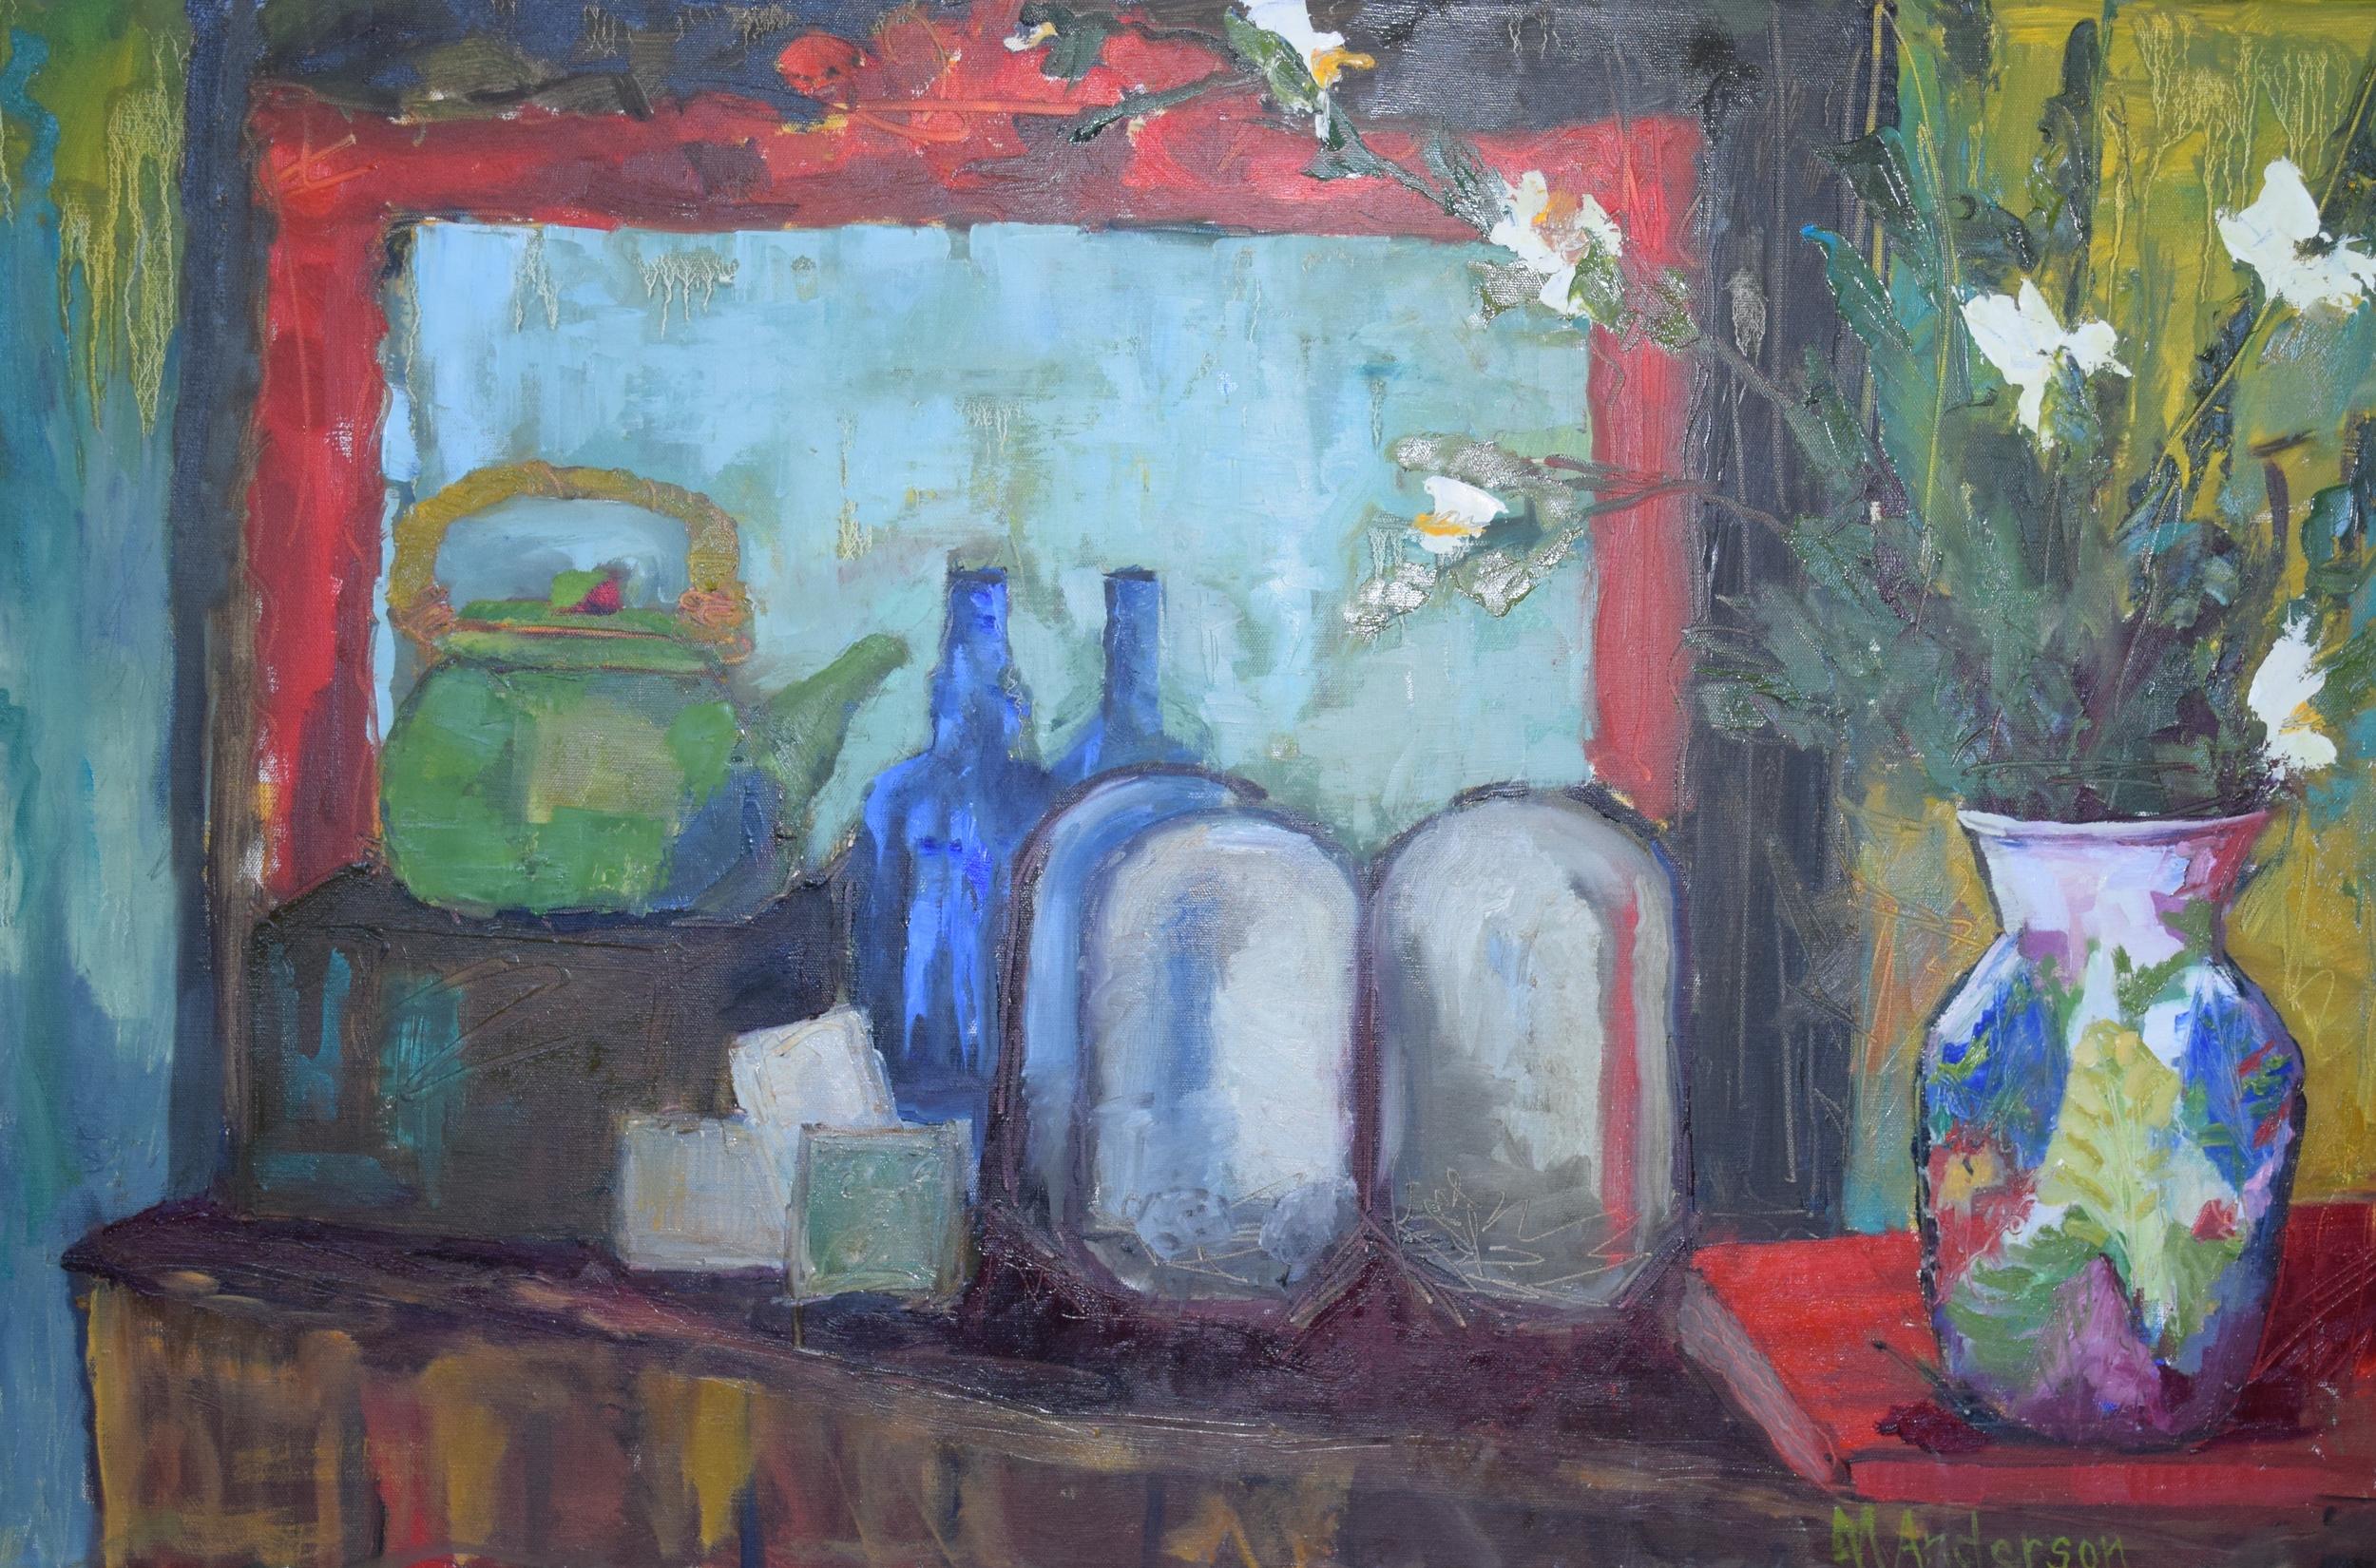 Treasure Table (24x36 Canvas) - Sold